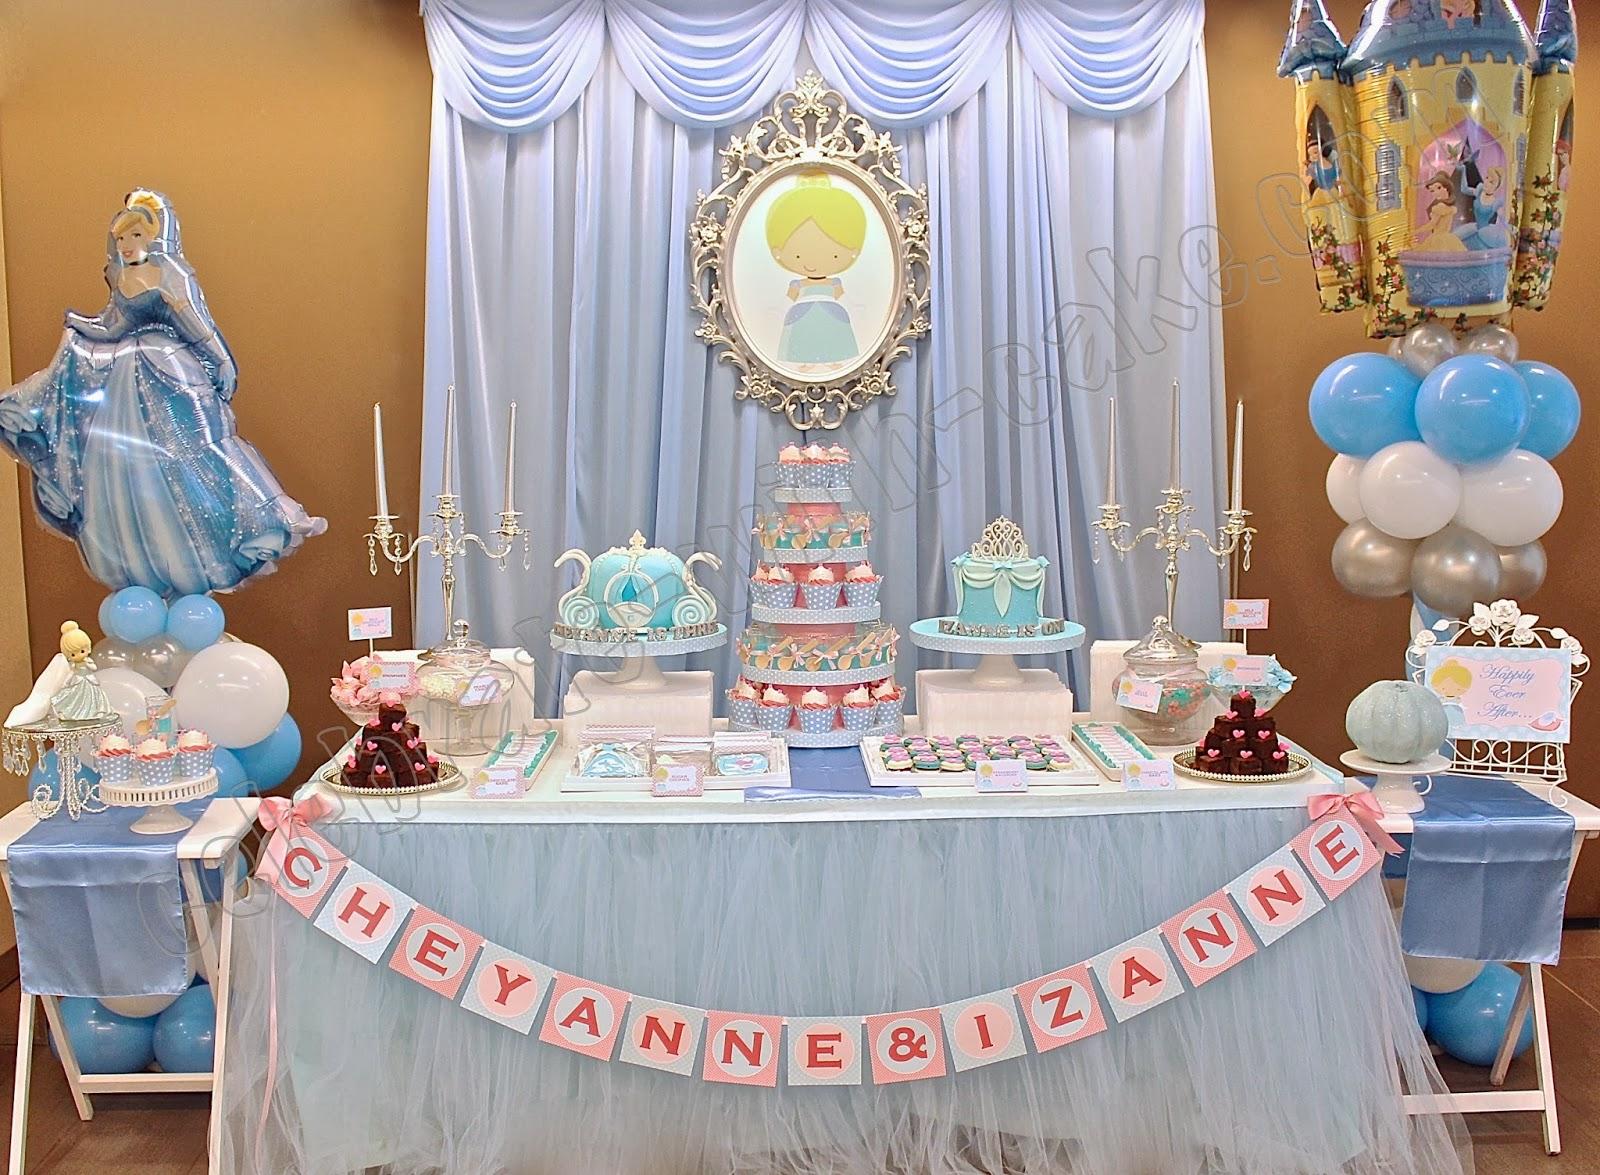 Celebrate with cake cinderella dessert table click post for La table a dessert